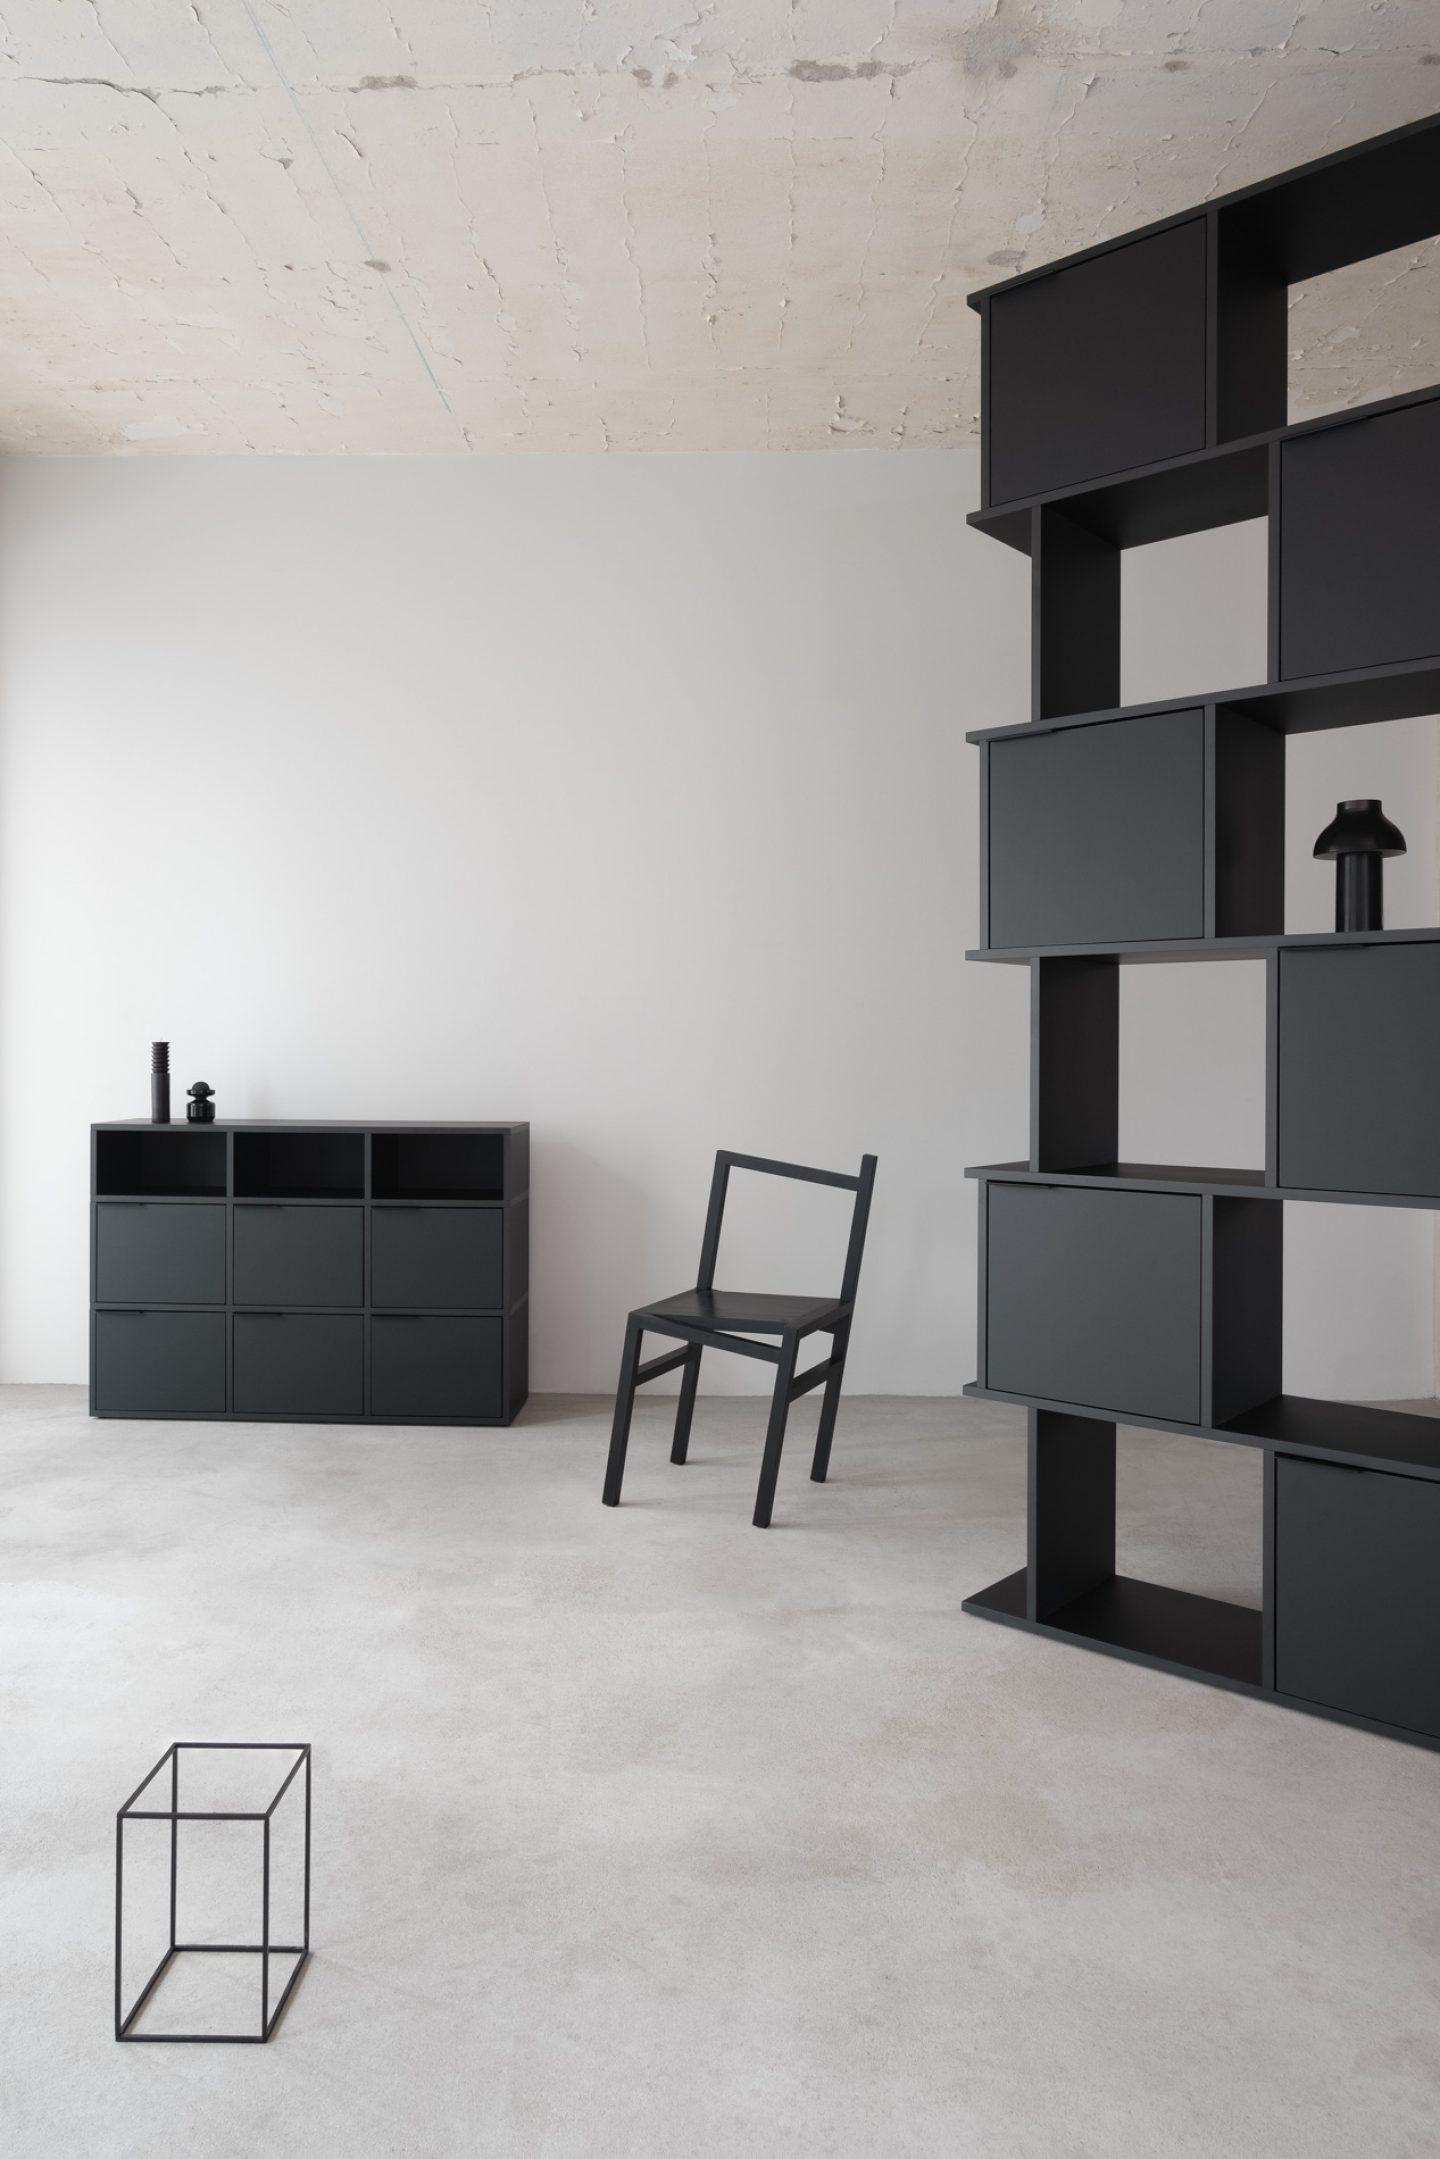 IGNANT-Tylko-shelf-design-Clemens-Poloczek--4